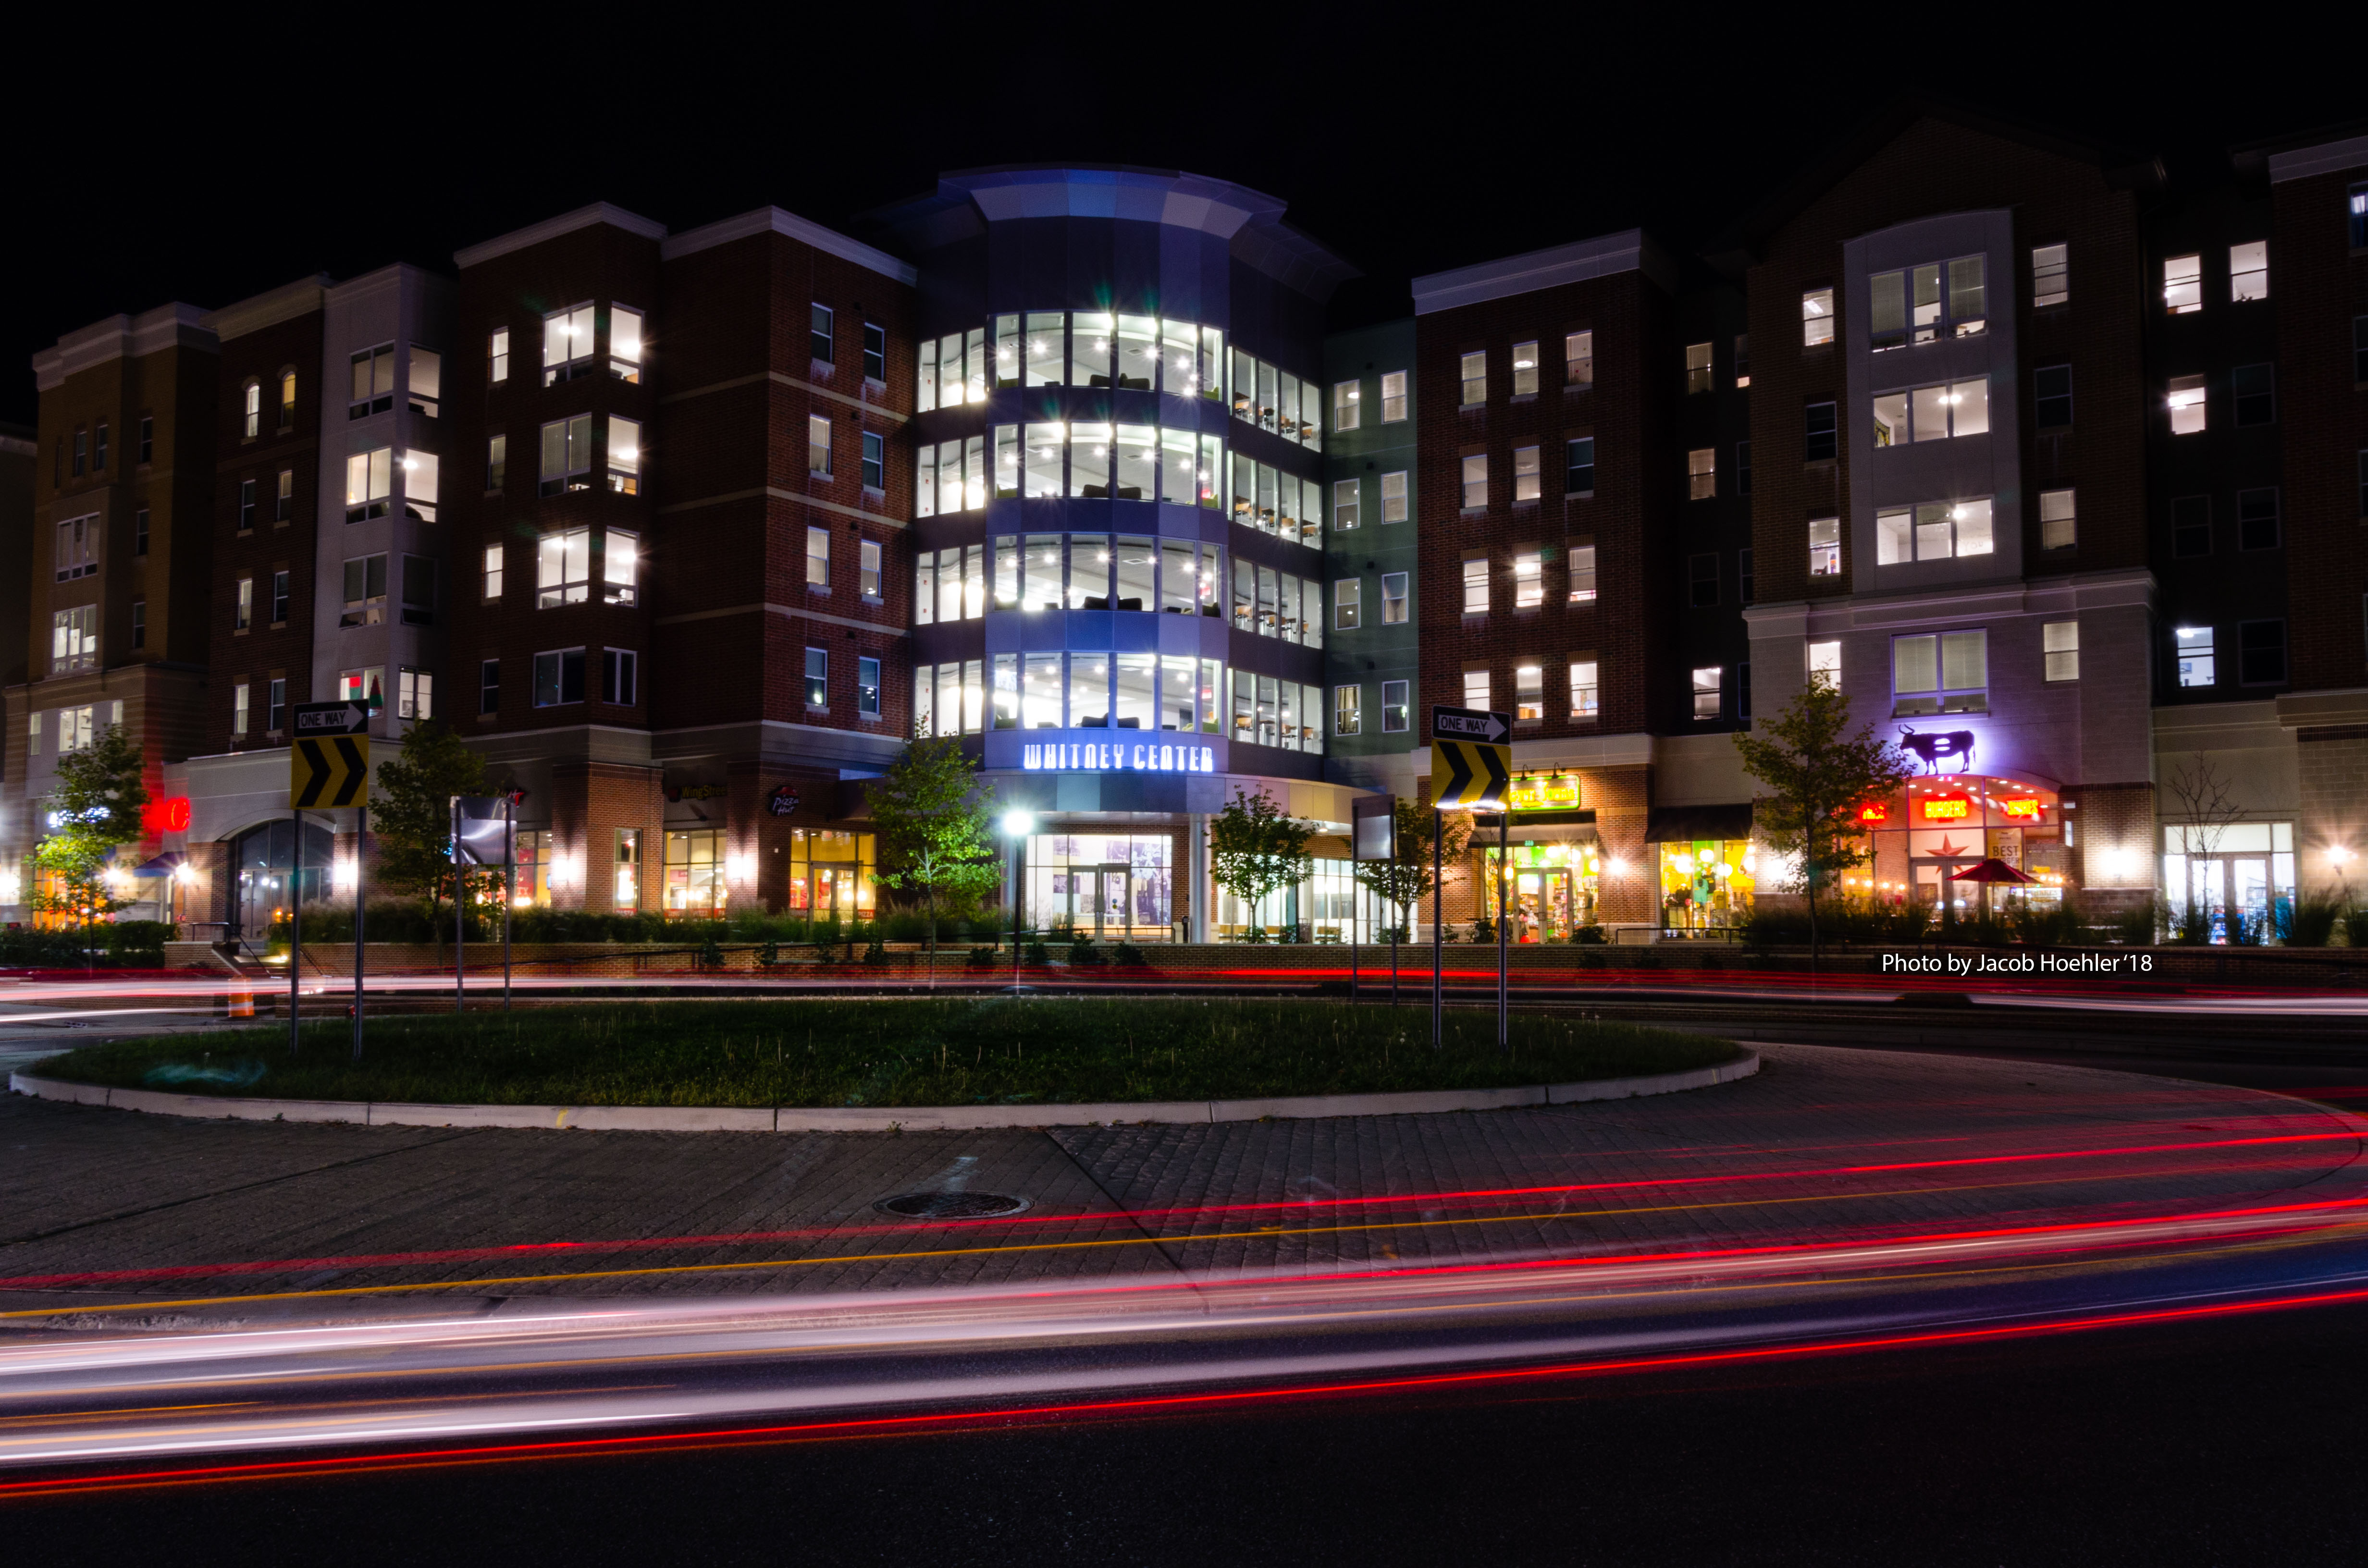 Whitney at night rowan university